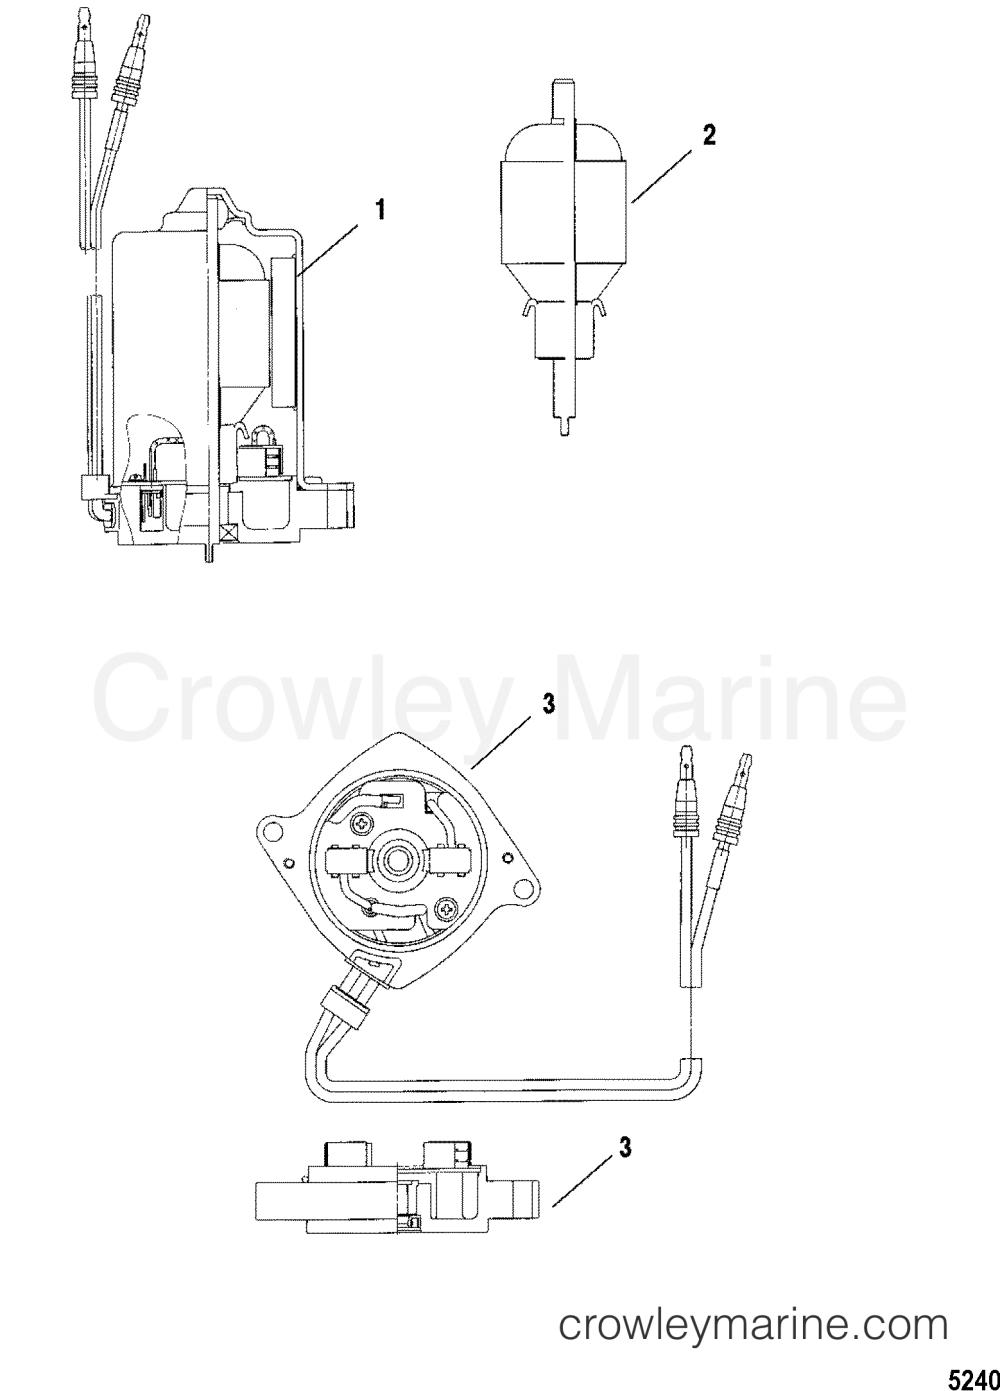 medium resolution of mercruiser wiring harness on johnson outboard manual